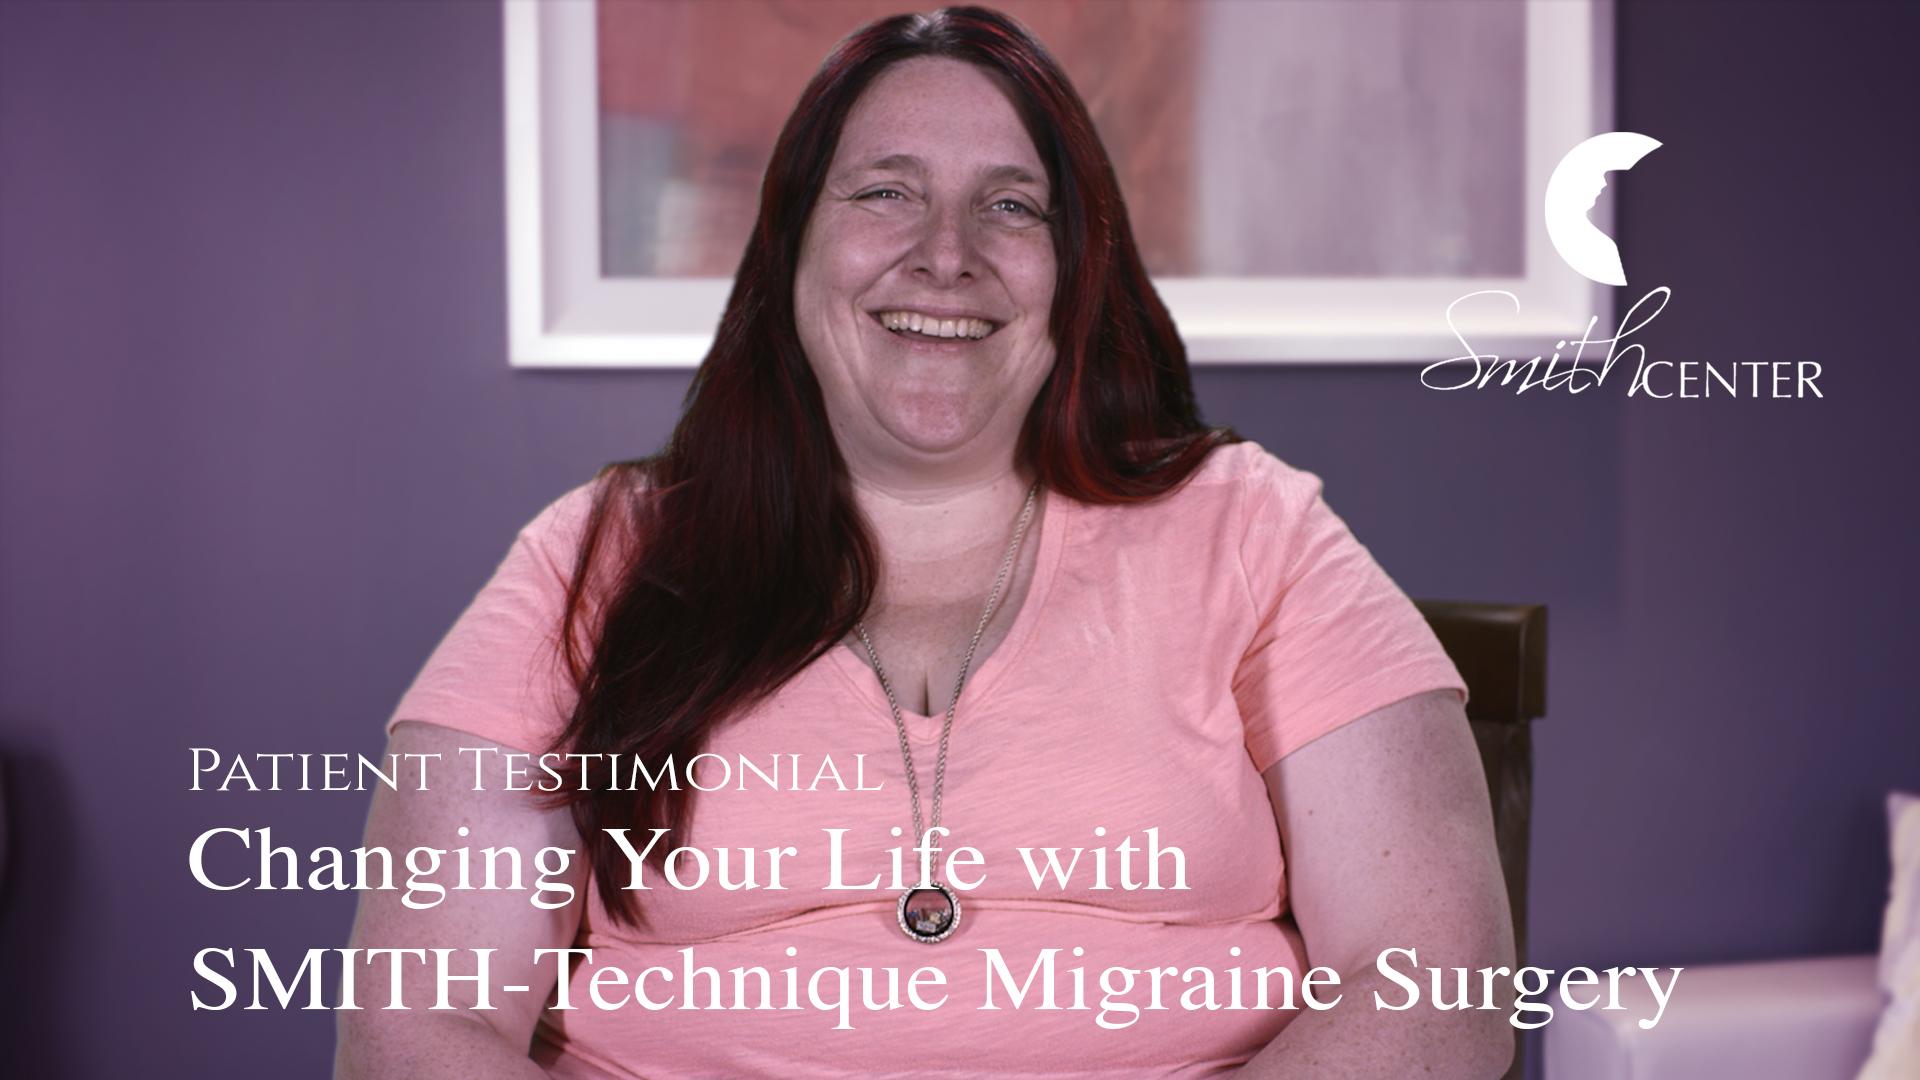 SMITH-Technique migraine surgery